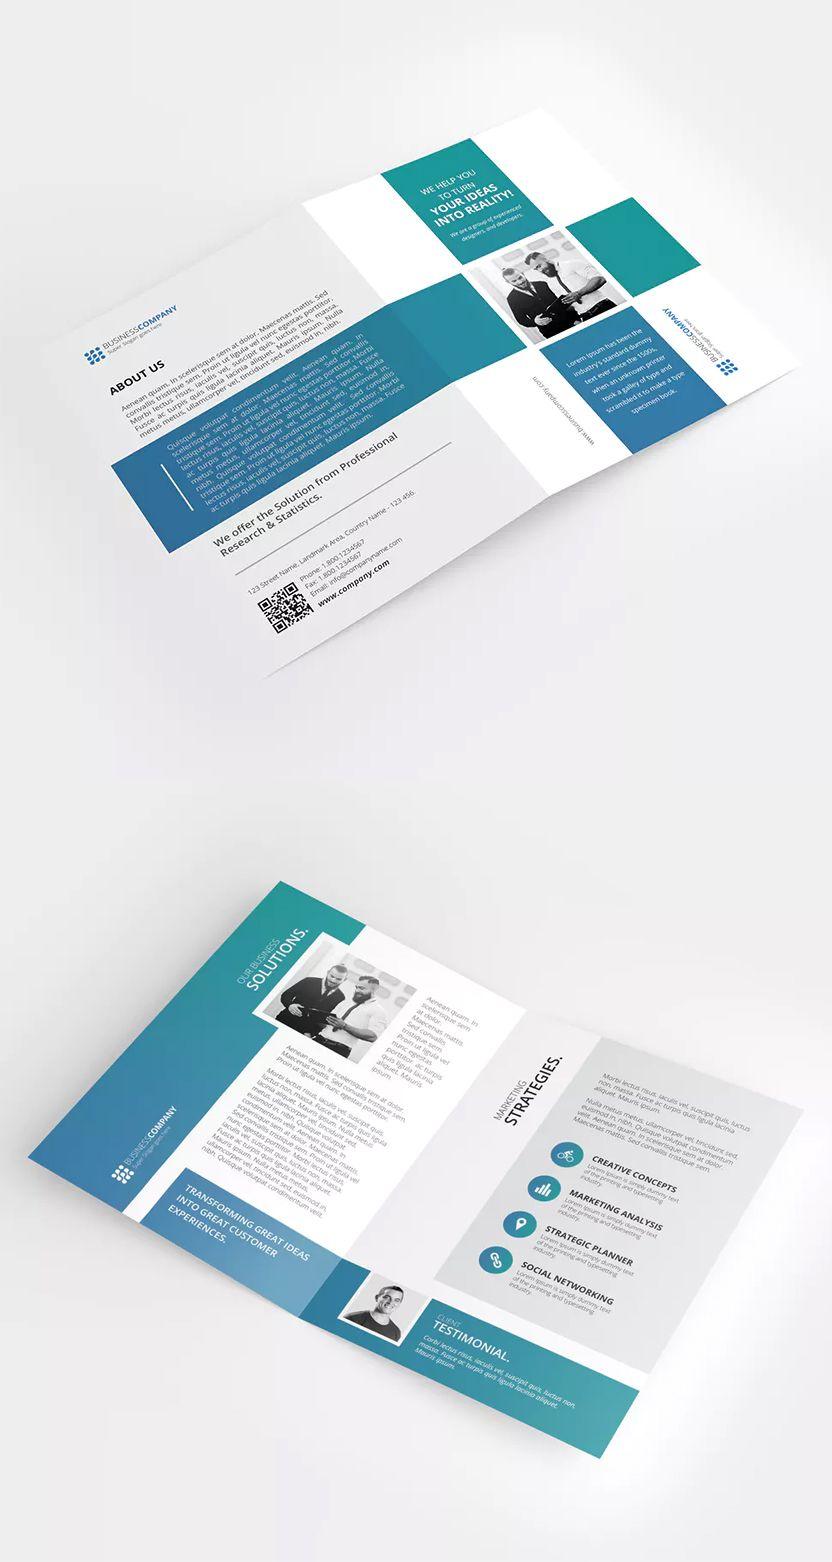 A4 Bifold Brochure By Graphix Shiv On Envato Elements Brochure Design Template Brochure Template Brochure Template Psd